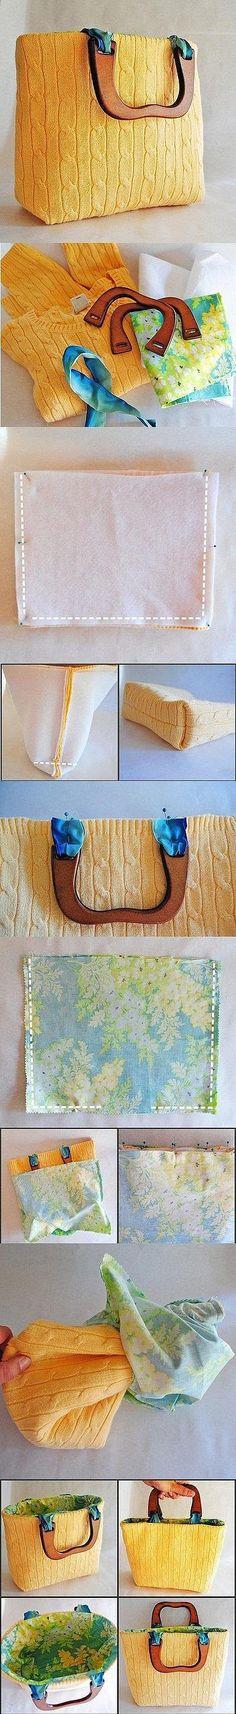 DIY handmade sweater transformed into bags